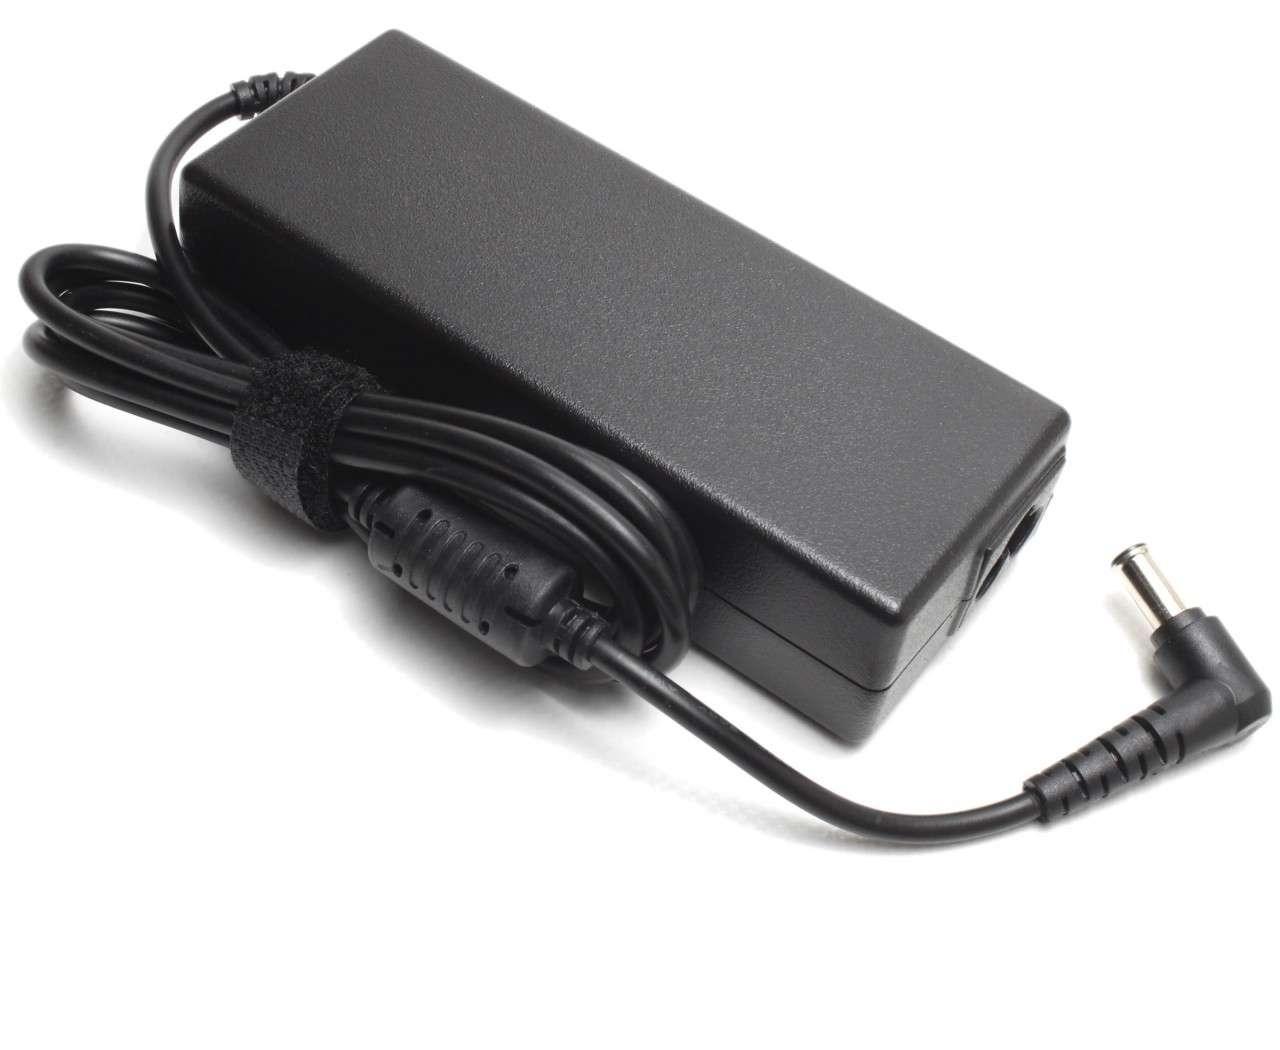 Incarcator Sony Vaio VGN FS115 Replacement imagine powerlaptop.ro 2021